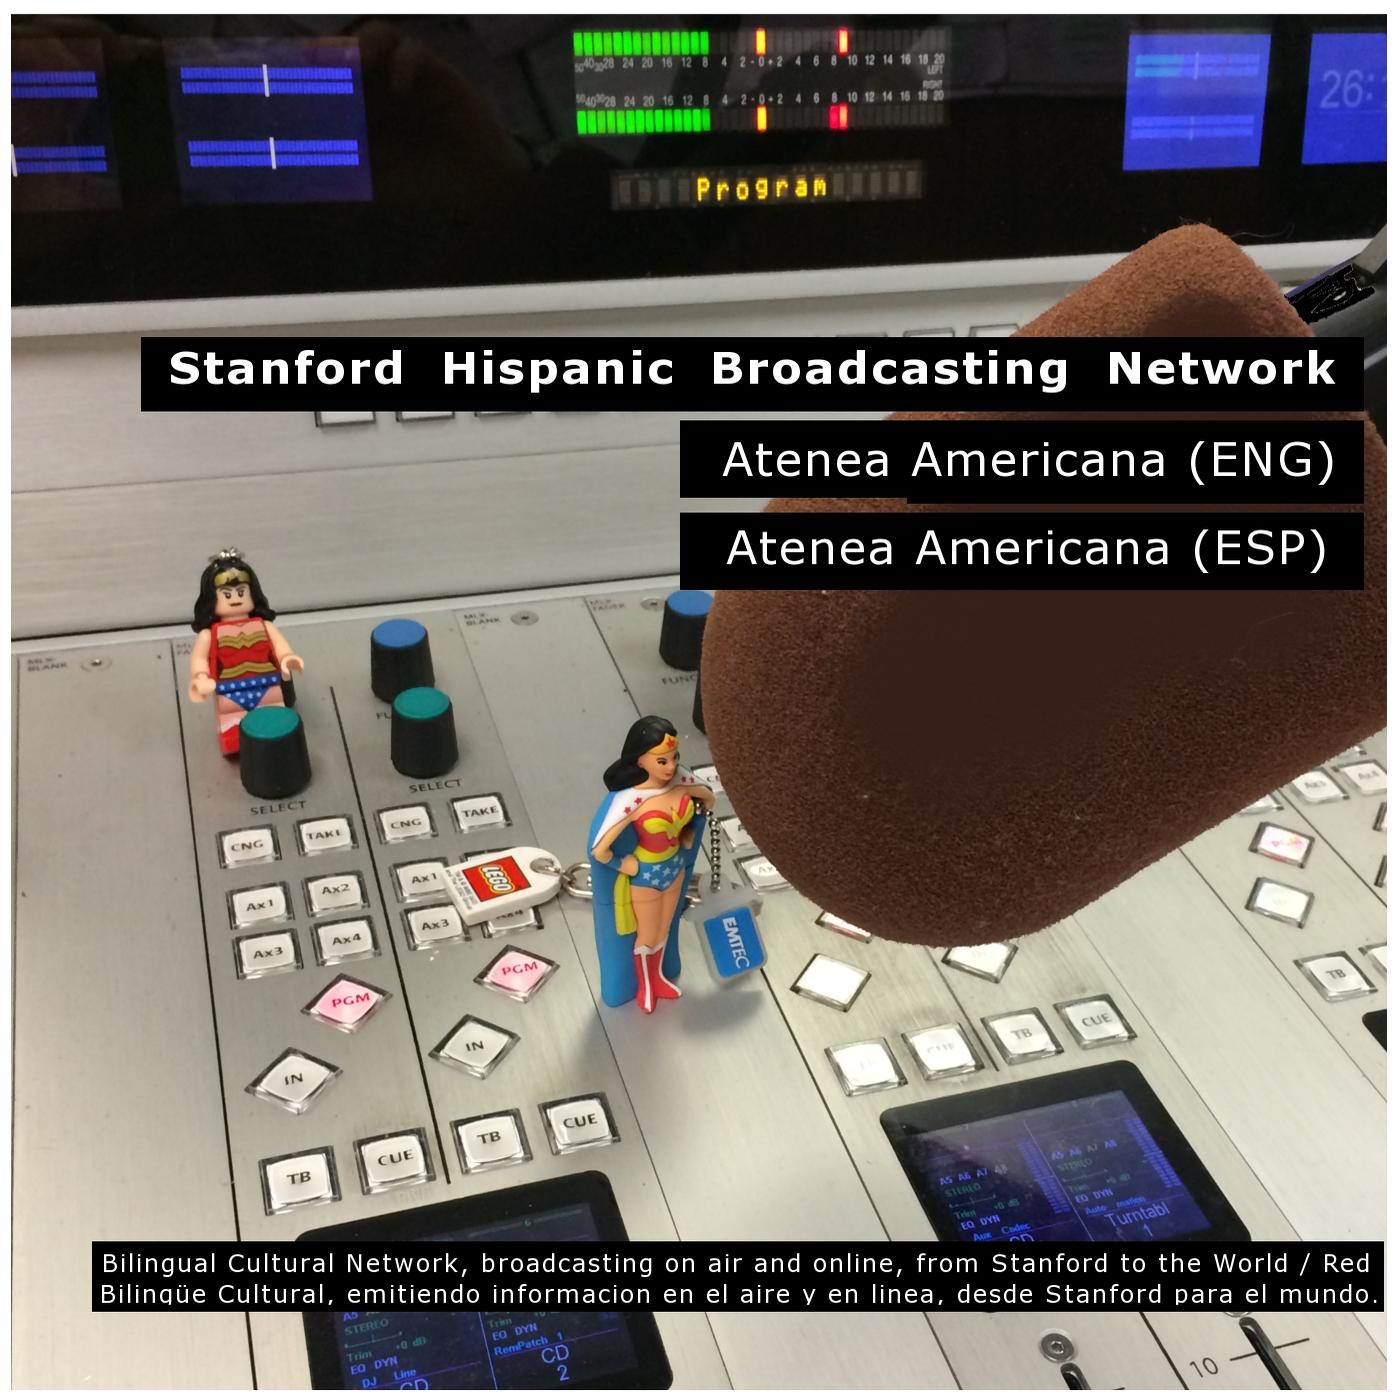 Stanford Hispanic Broadcasting